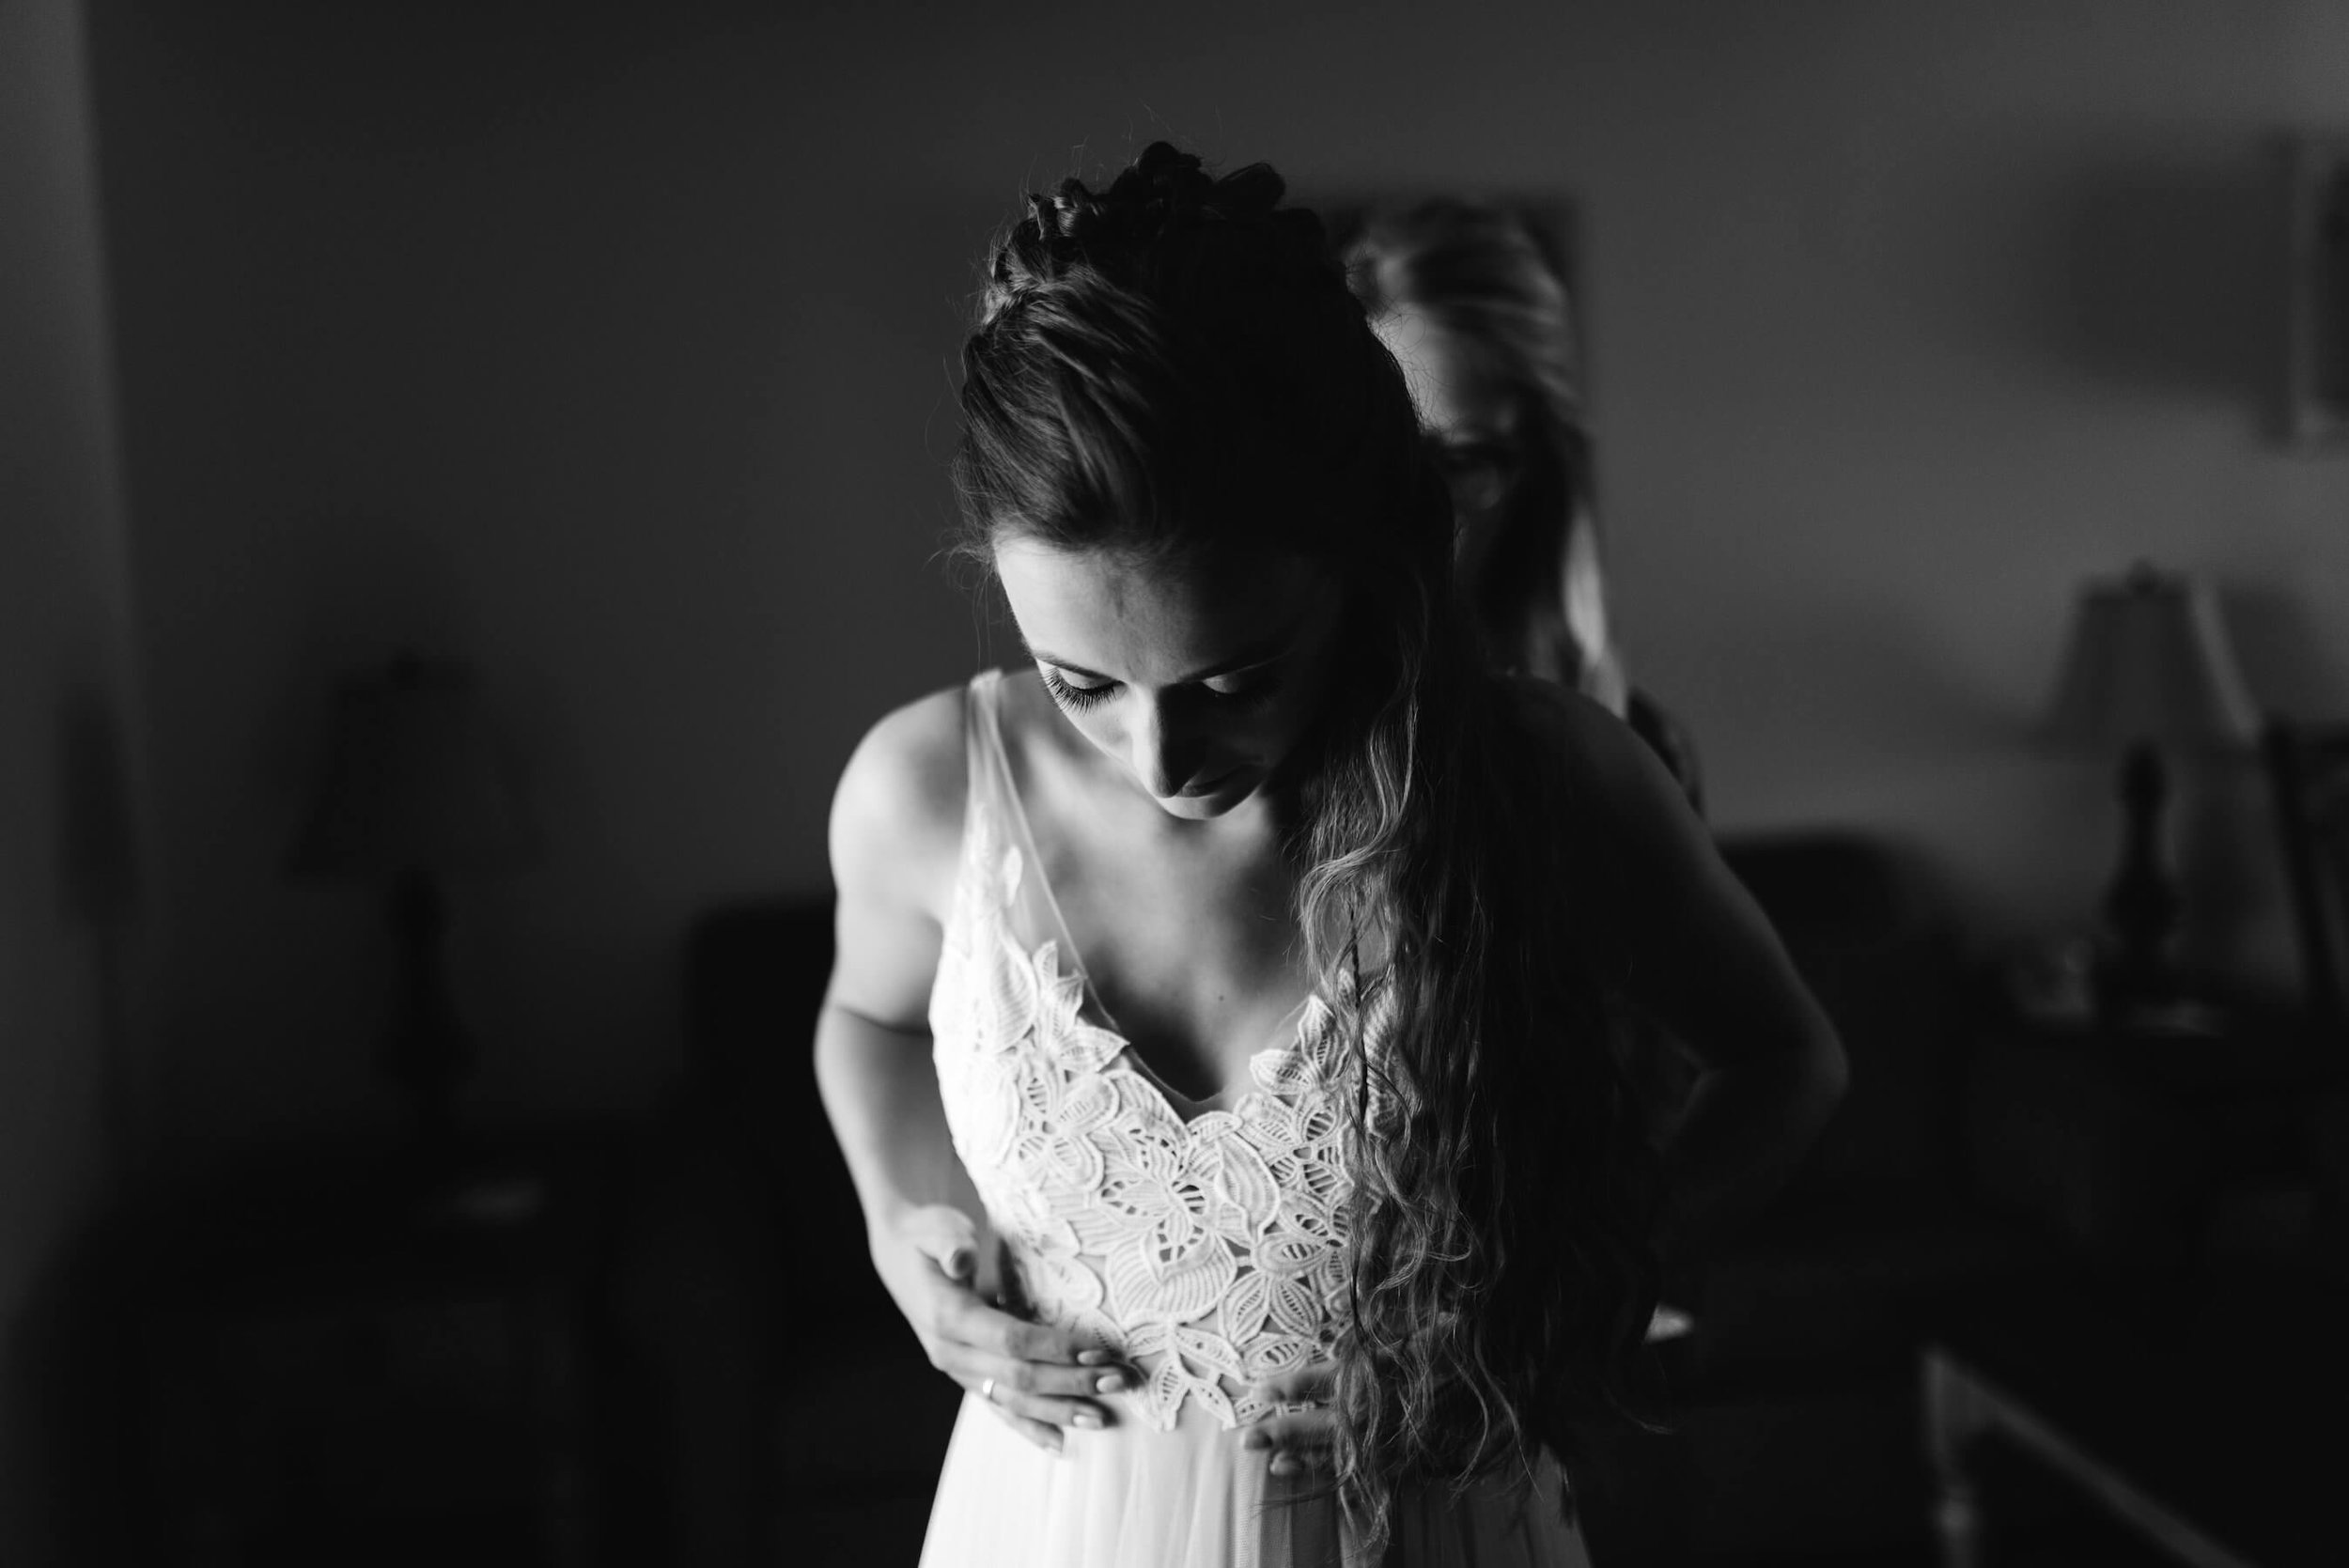 engle-olson-wedding-blair-taylor-9.jpg